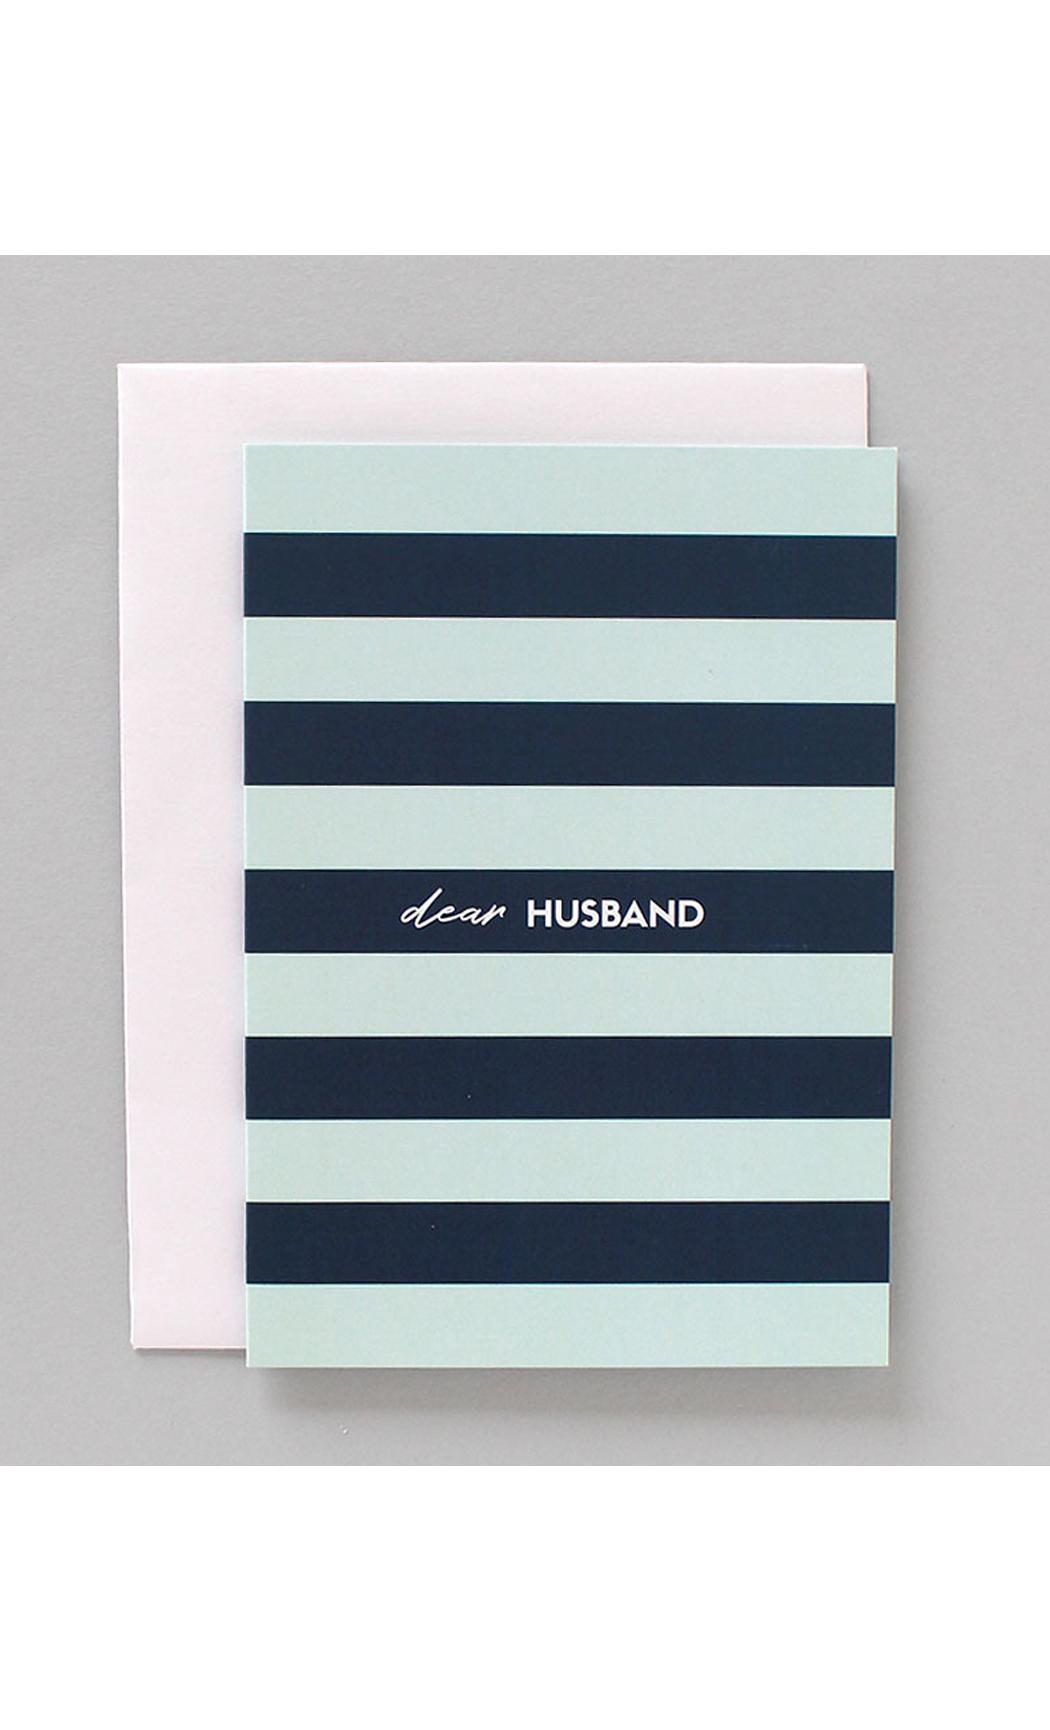 Dear Husband Greeting Card